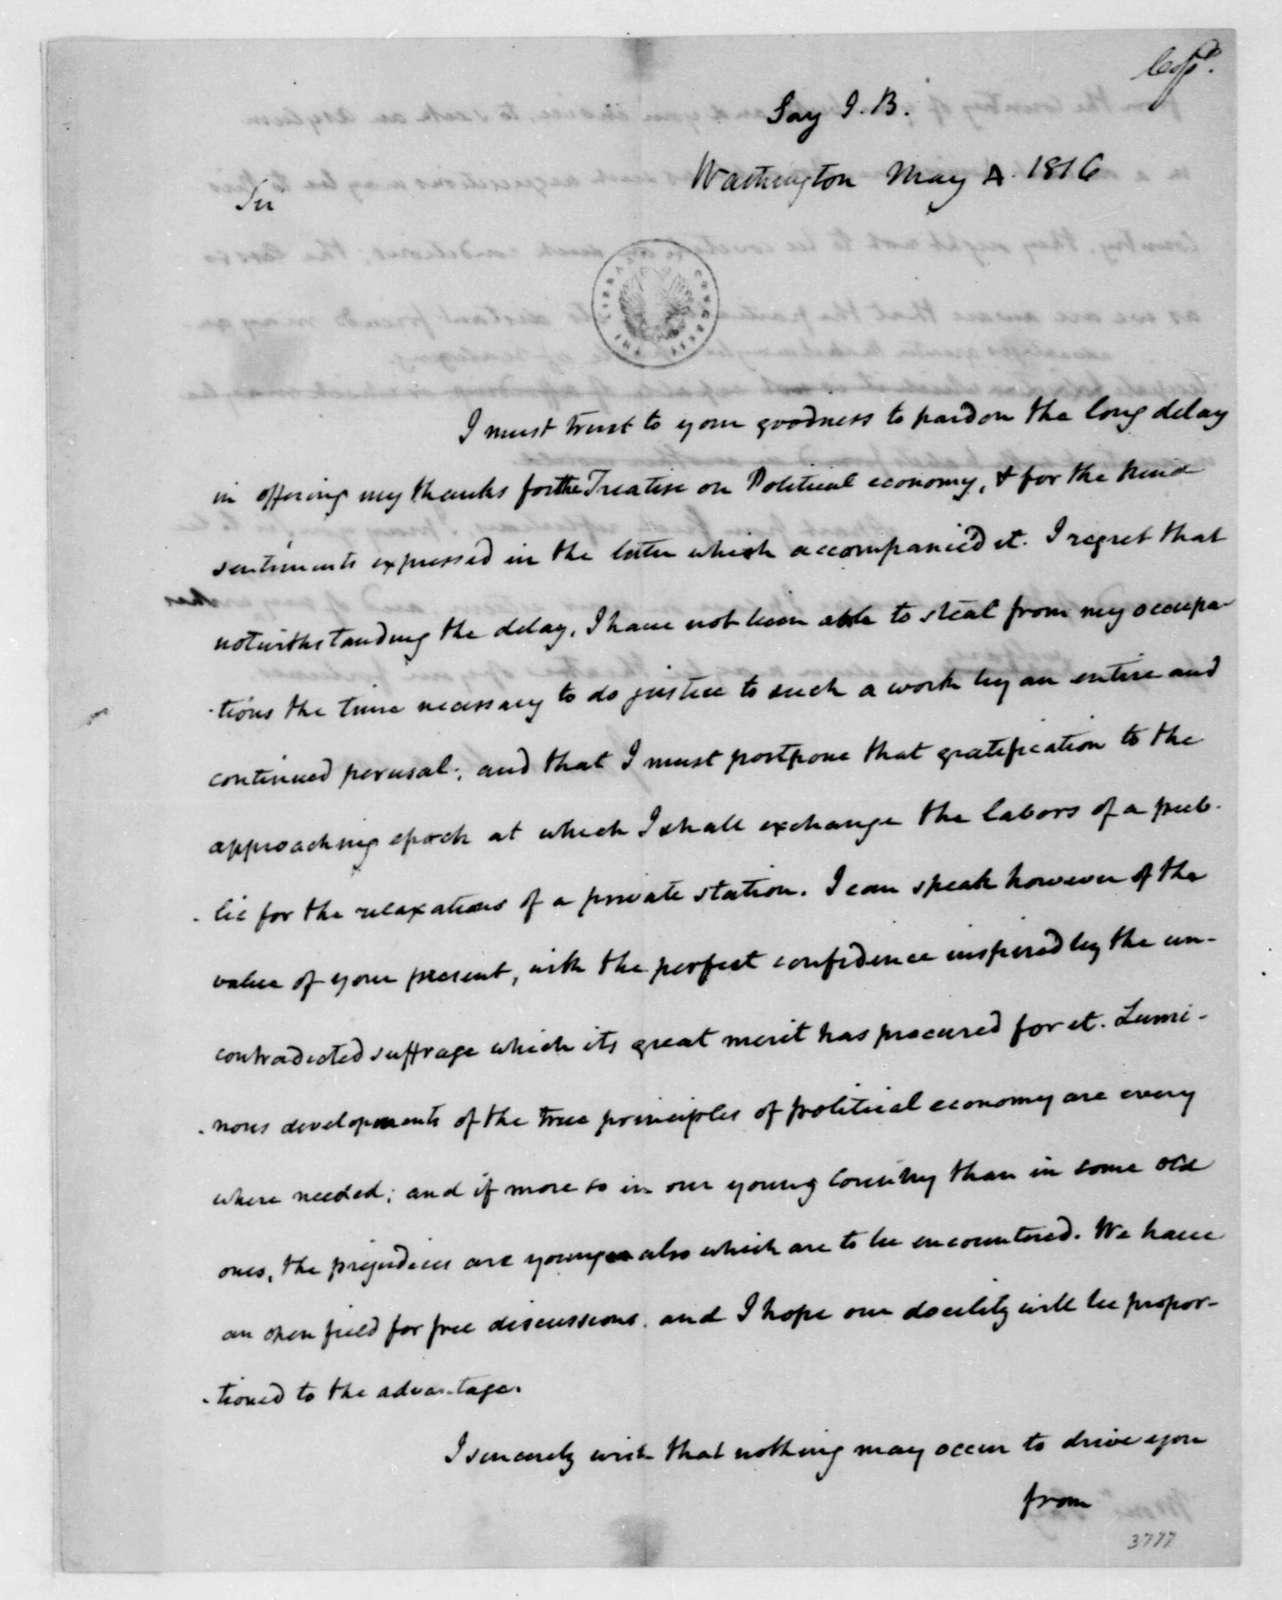 James Madison to J. B. Say, May 4, 1816.